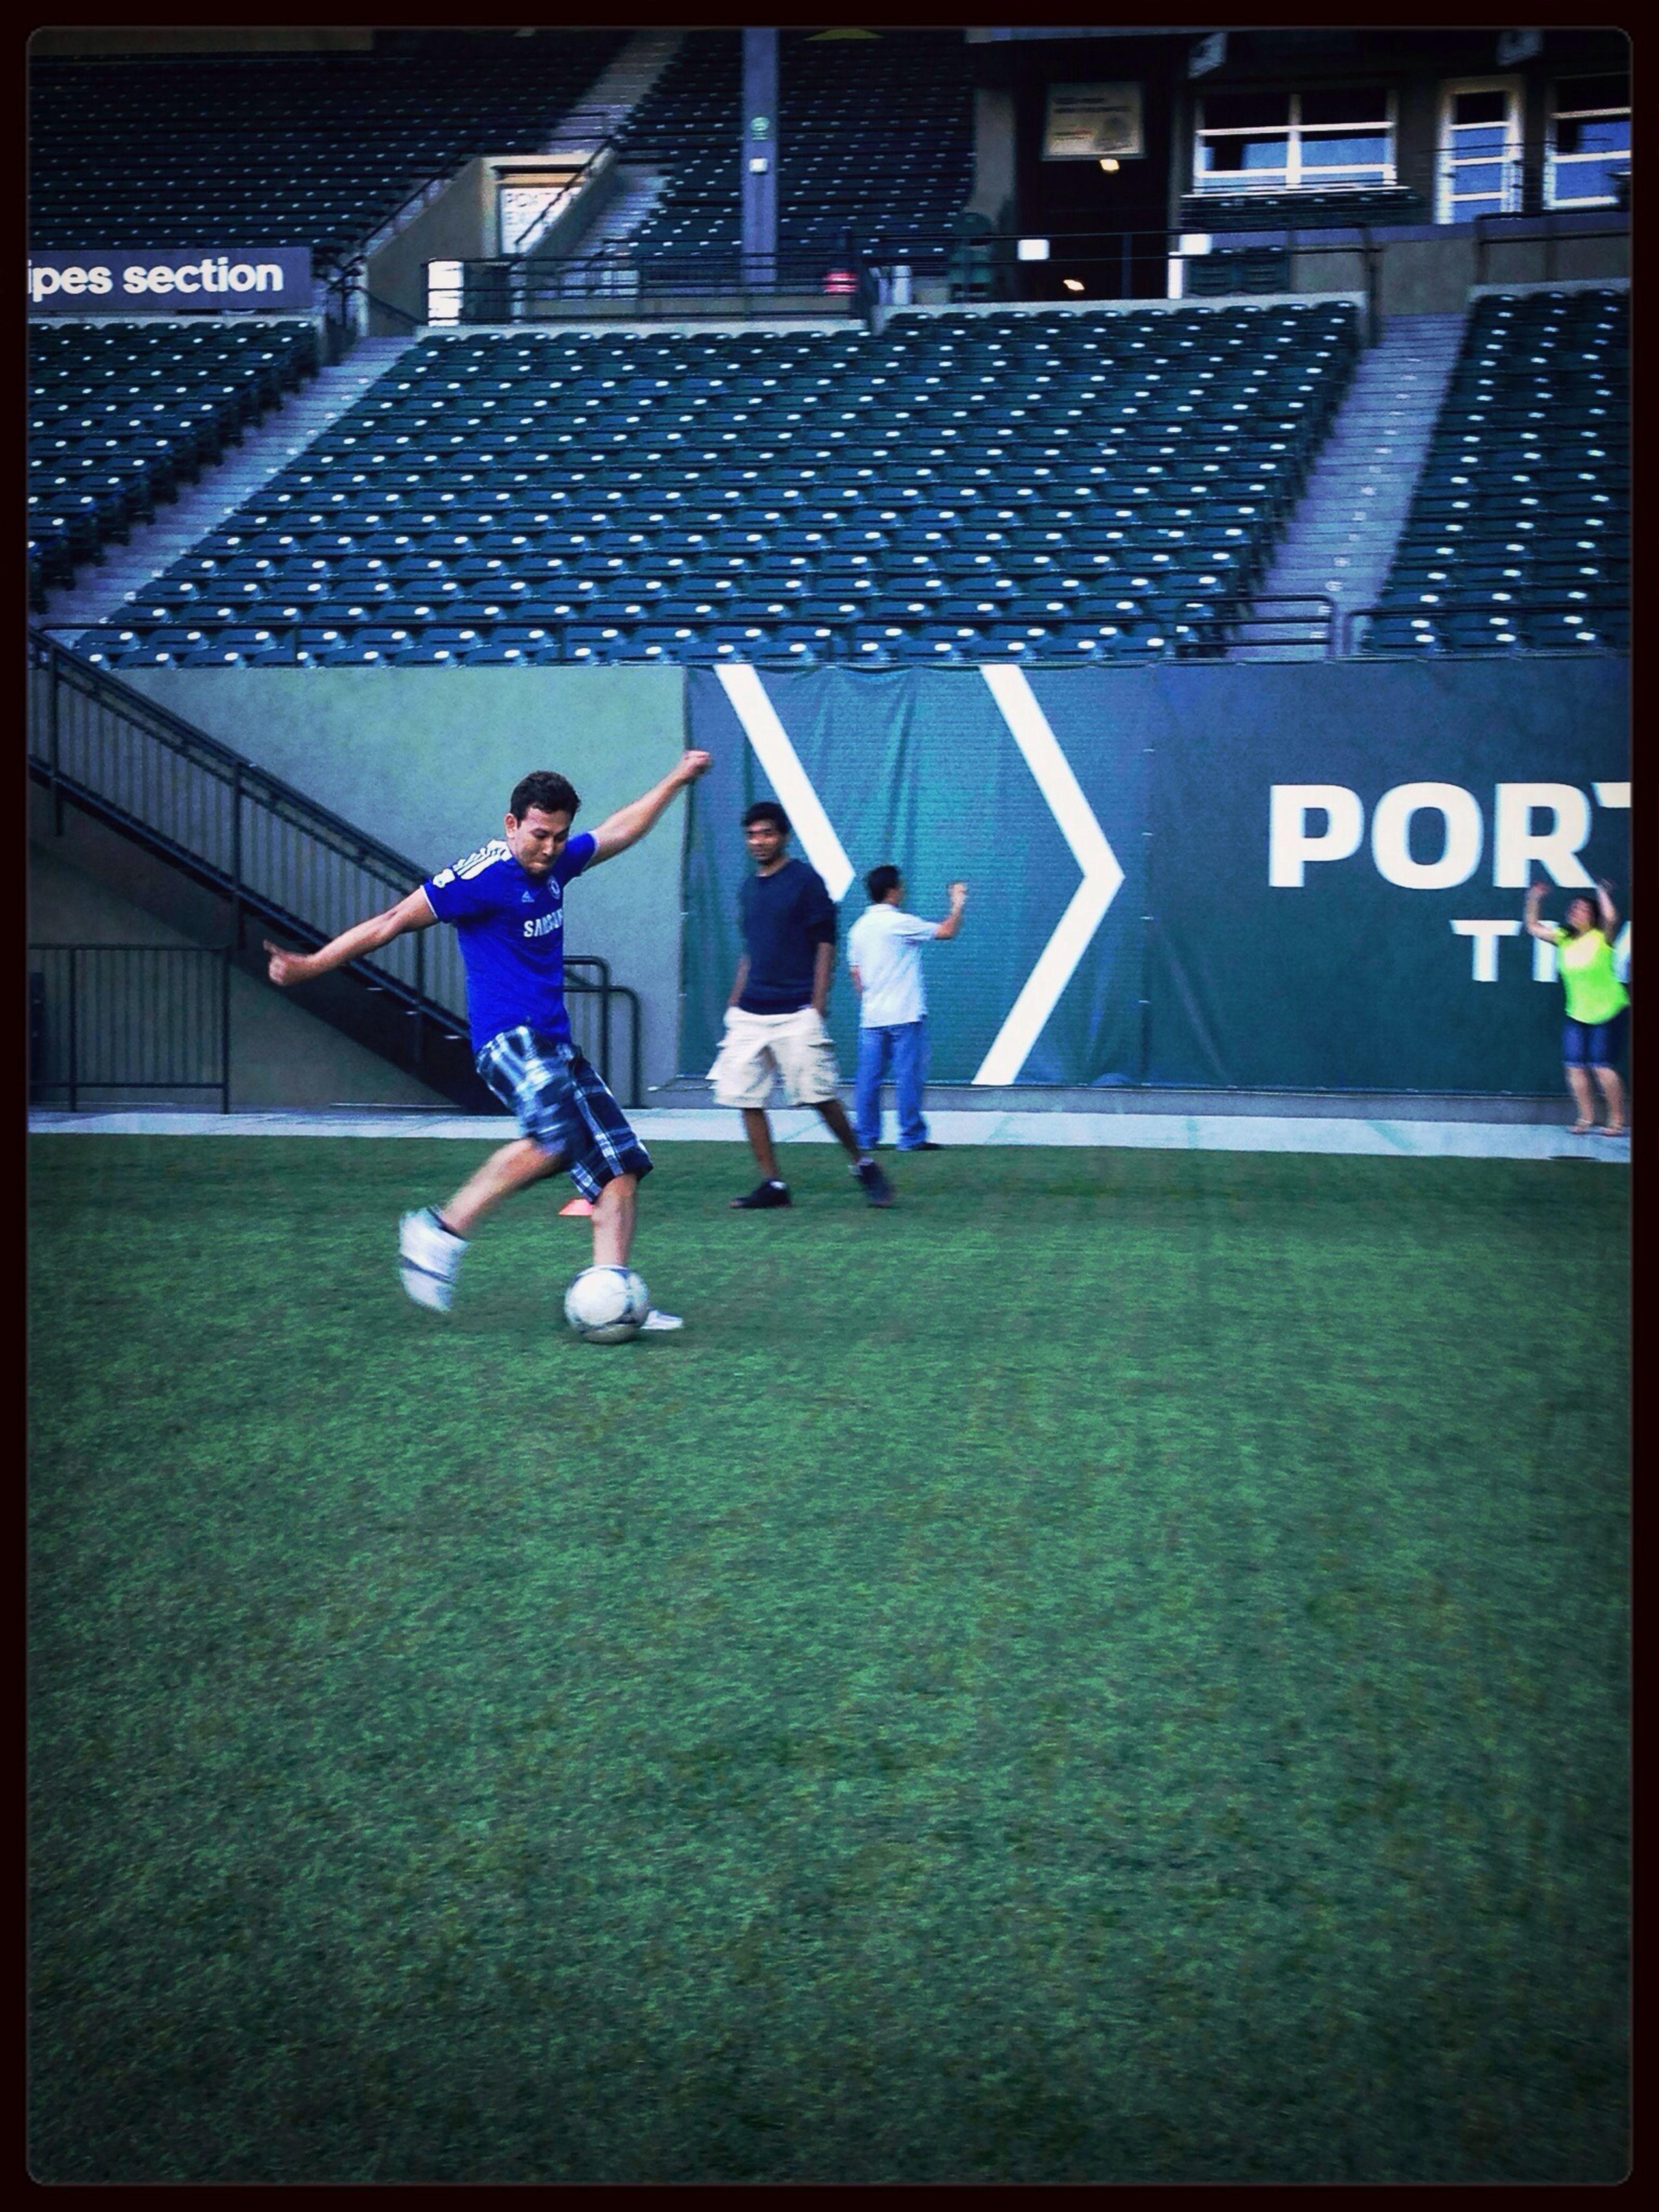 Kicking Some Ball @jeld-wen Field  Goal Portlandtimbers